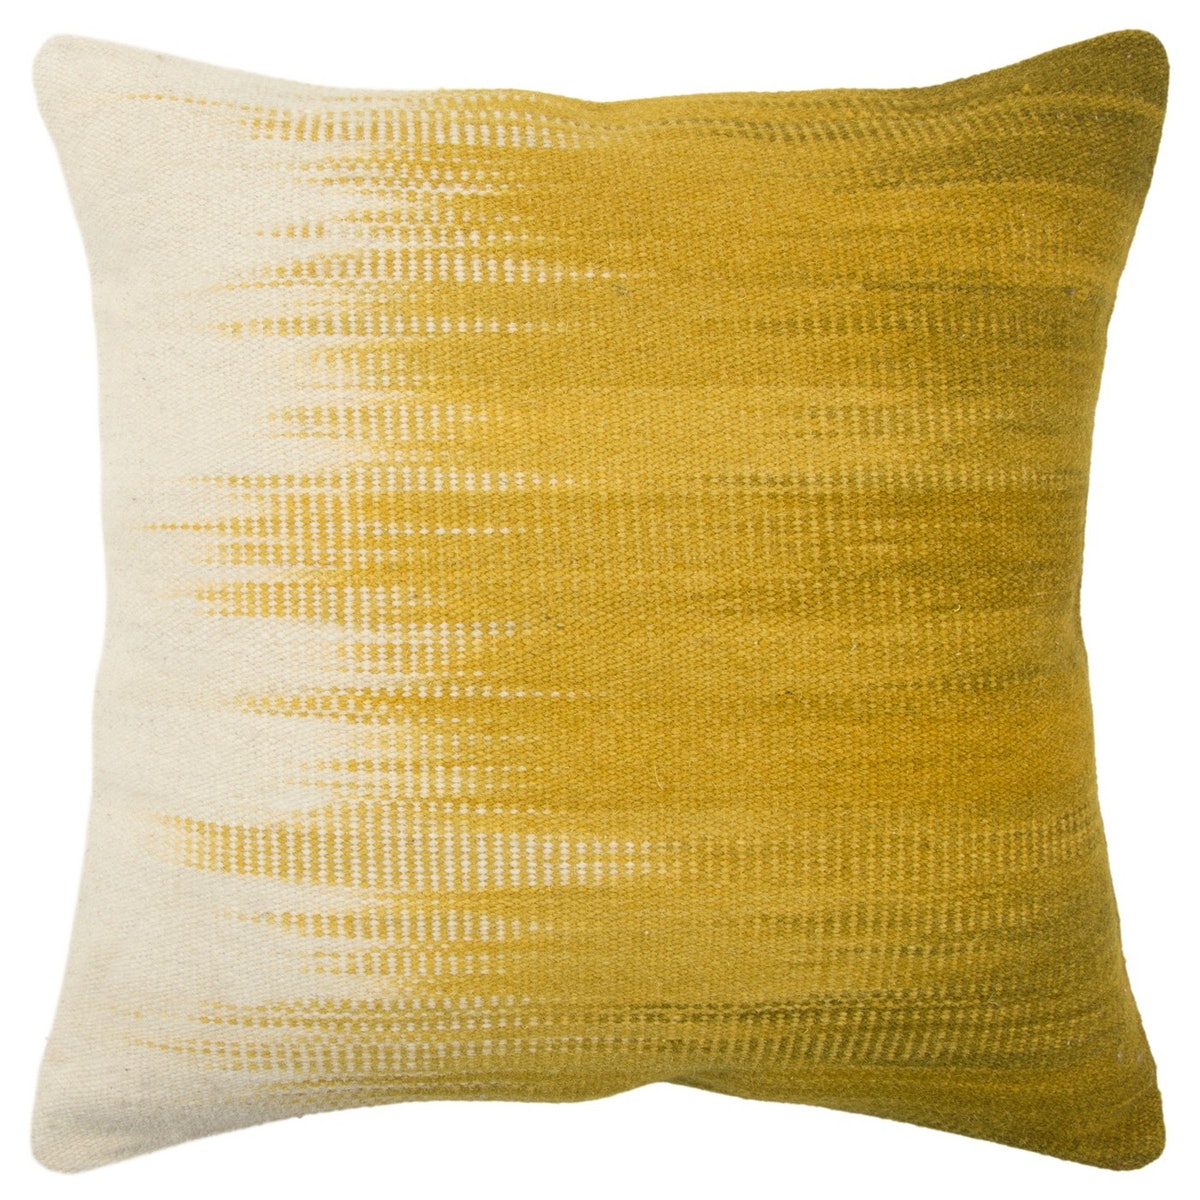 Decorative Filled Oversize Throw Pillow